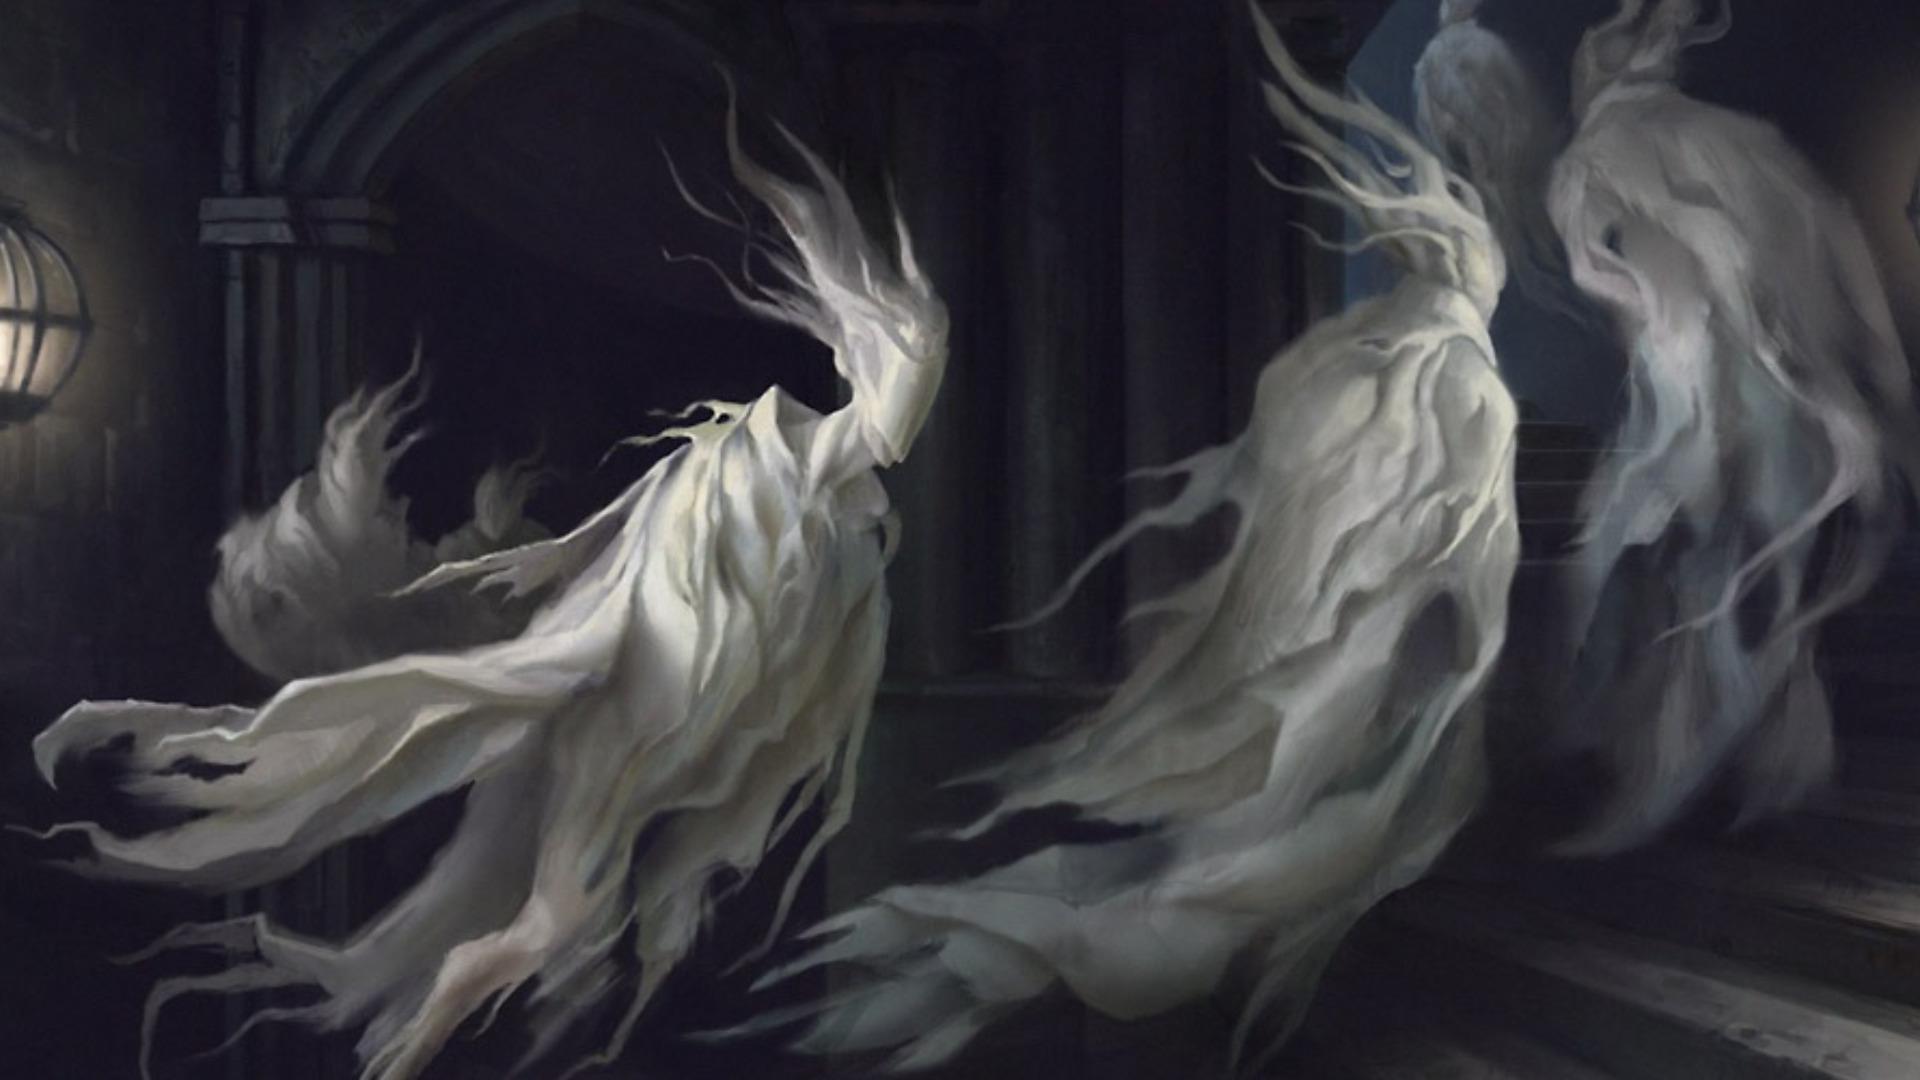 Dark   Ghost Wallpaper 1920x1080